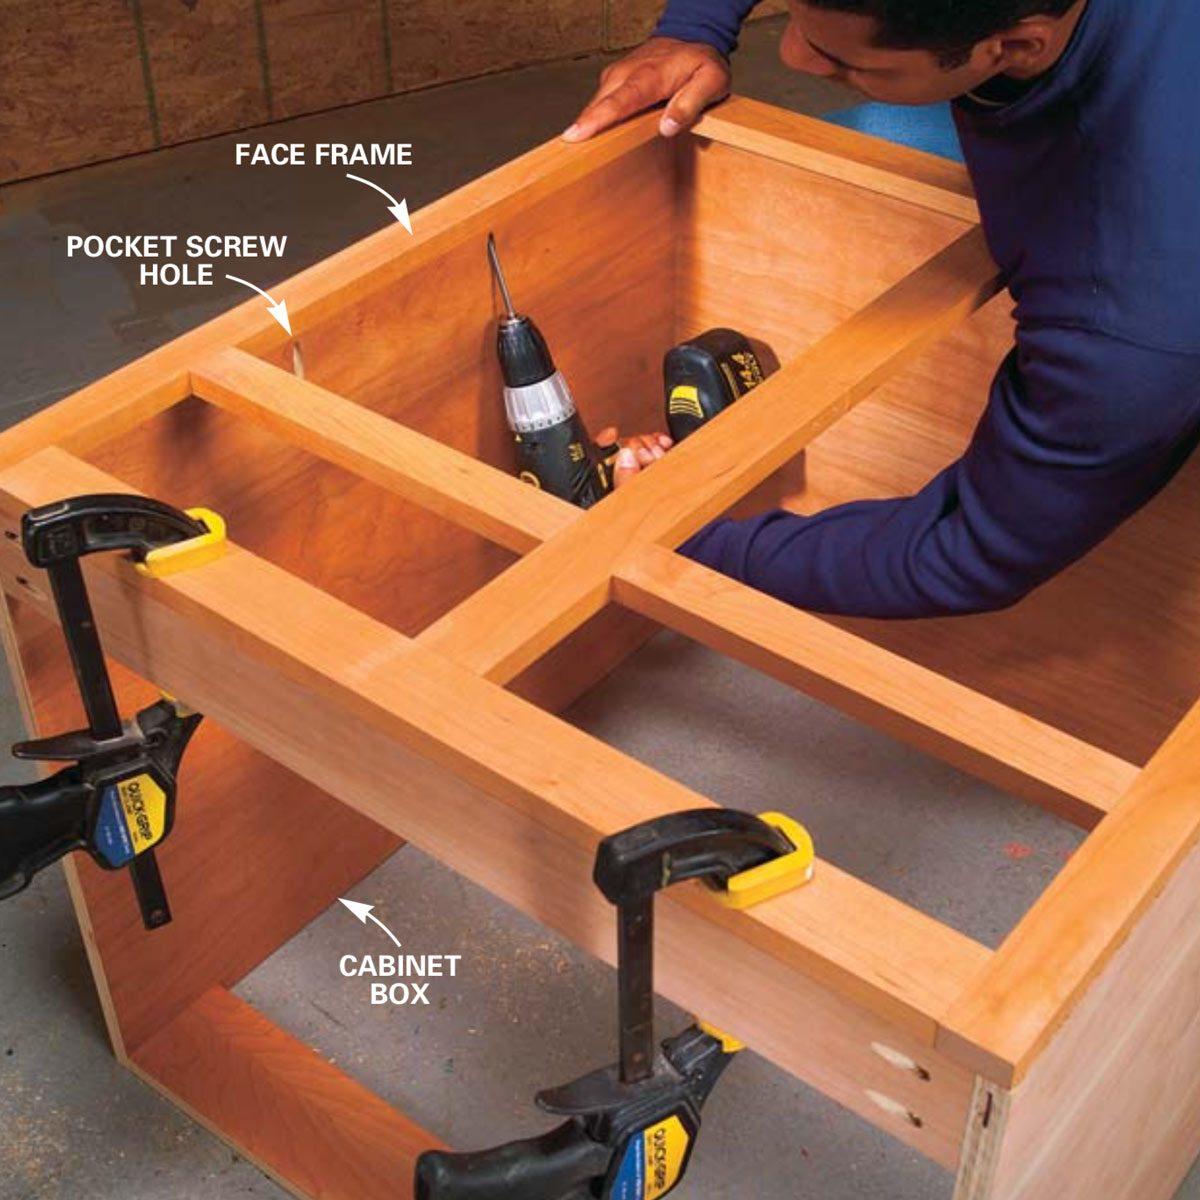 Learn How To Use Pocket Screws Family Handyman